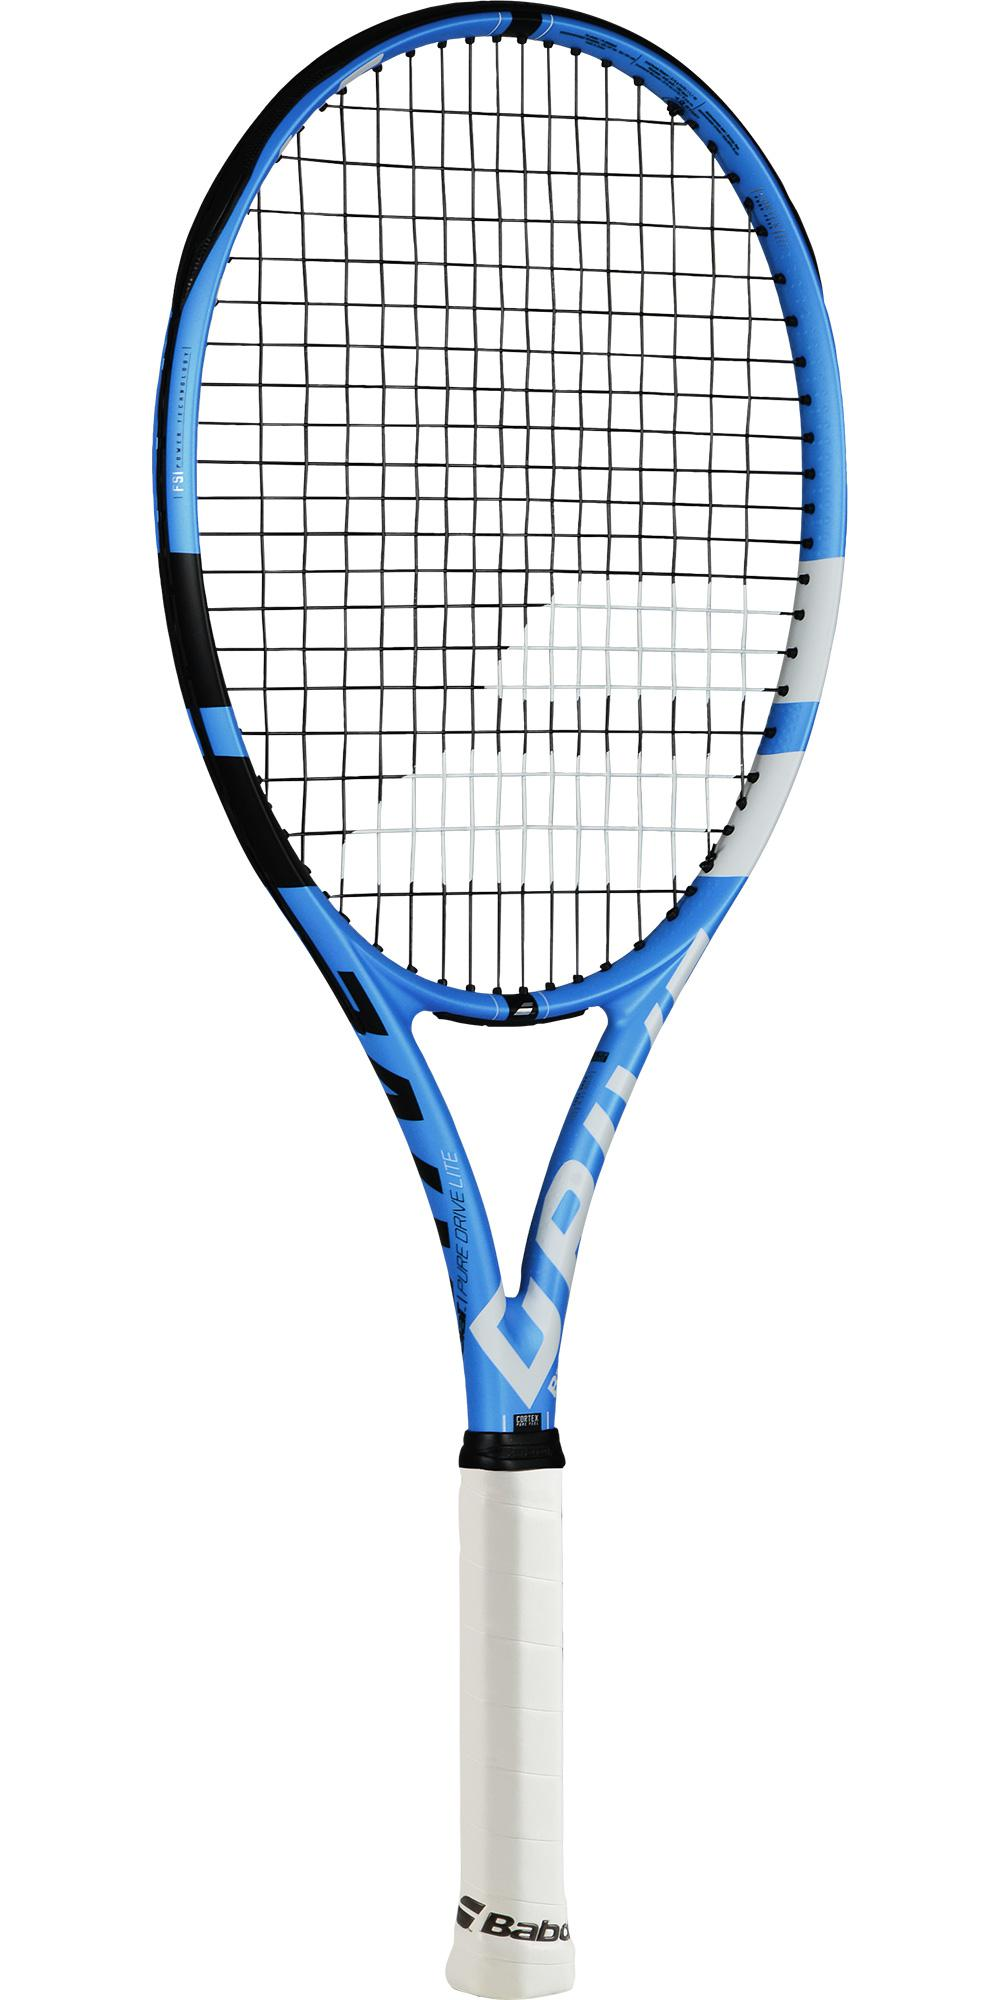 Babolat Ракетка для большого тенниса Babolat Pure Drive Super Lite сетки для тенниса большого